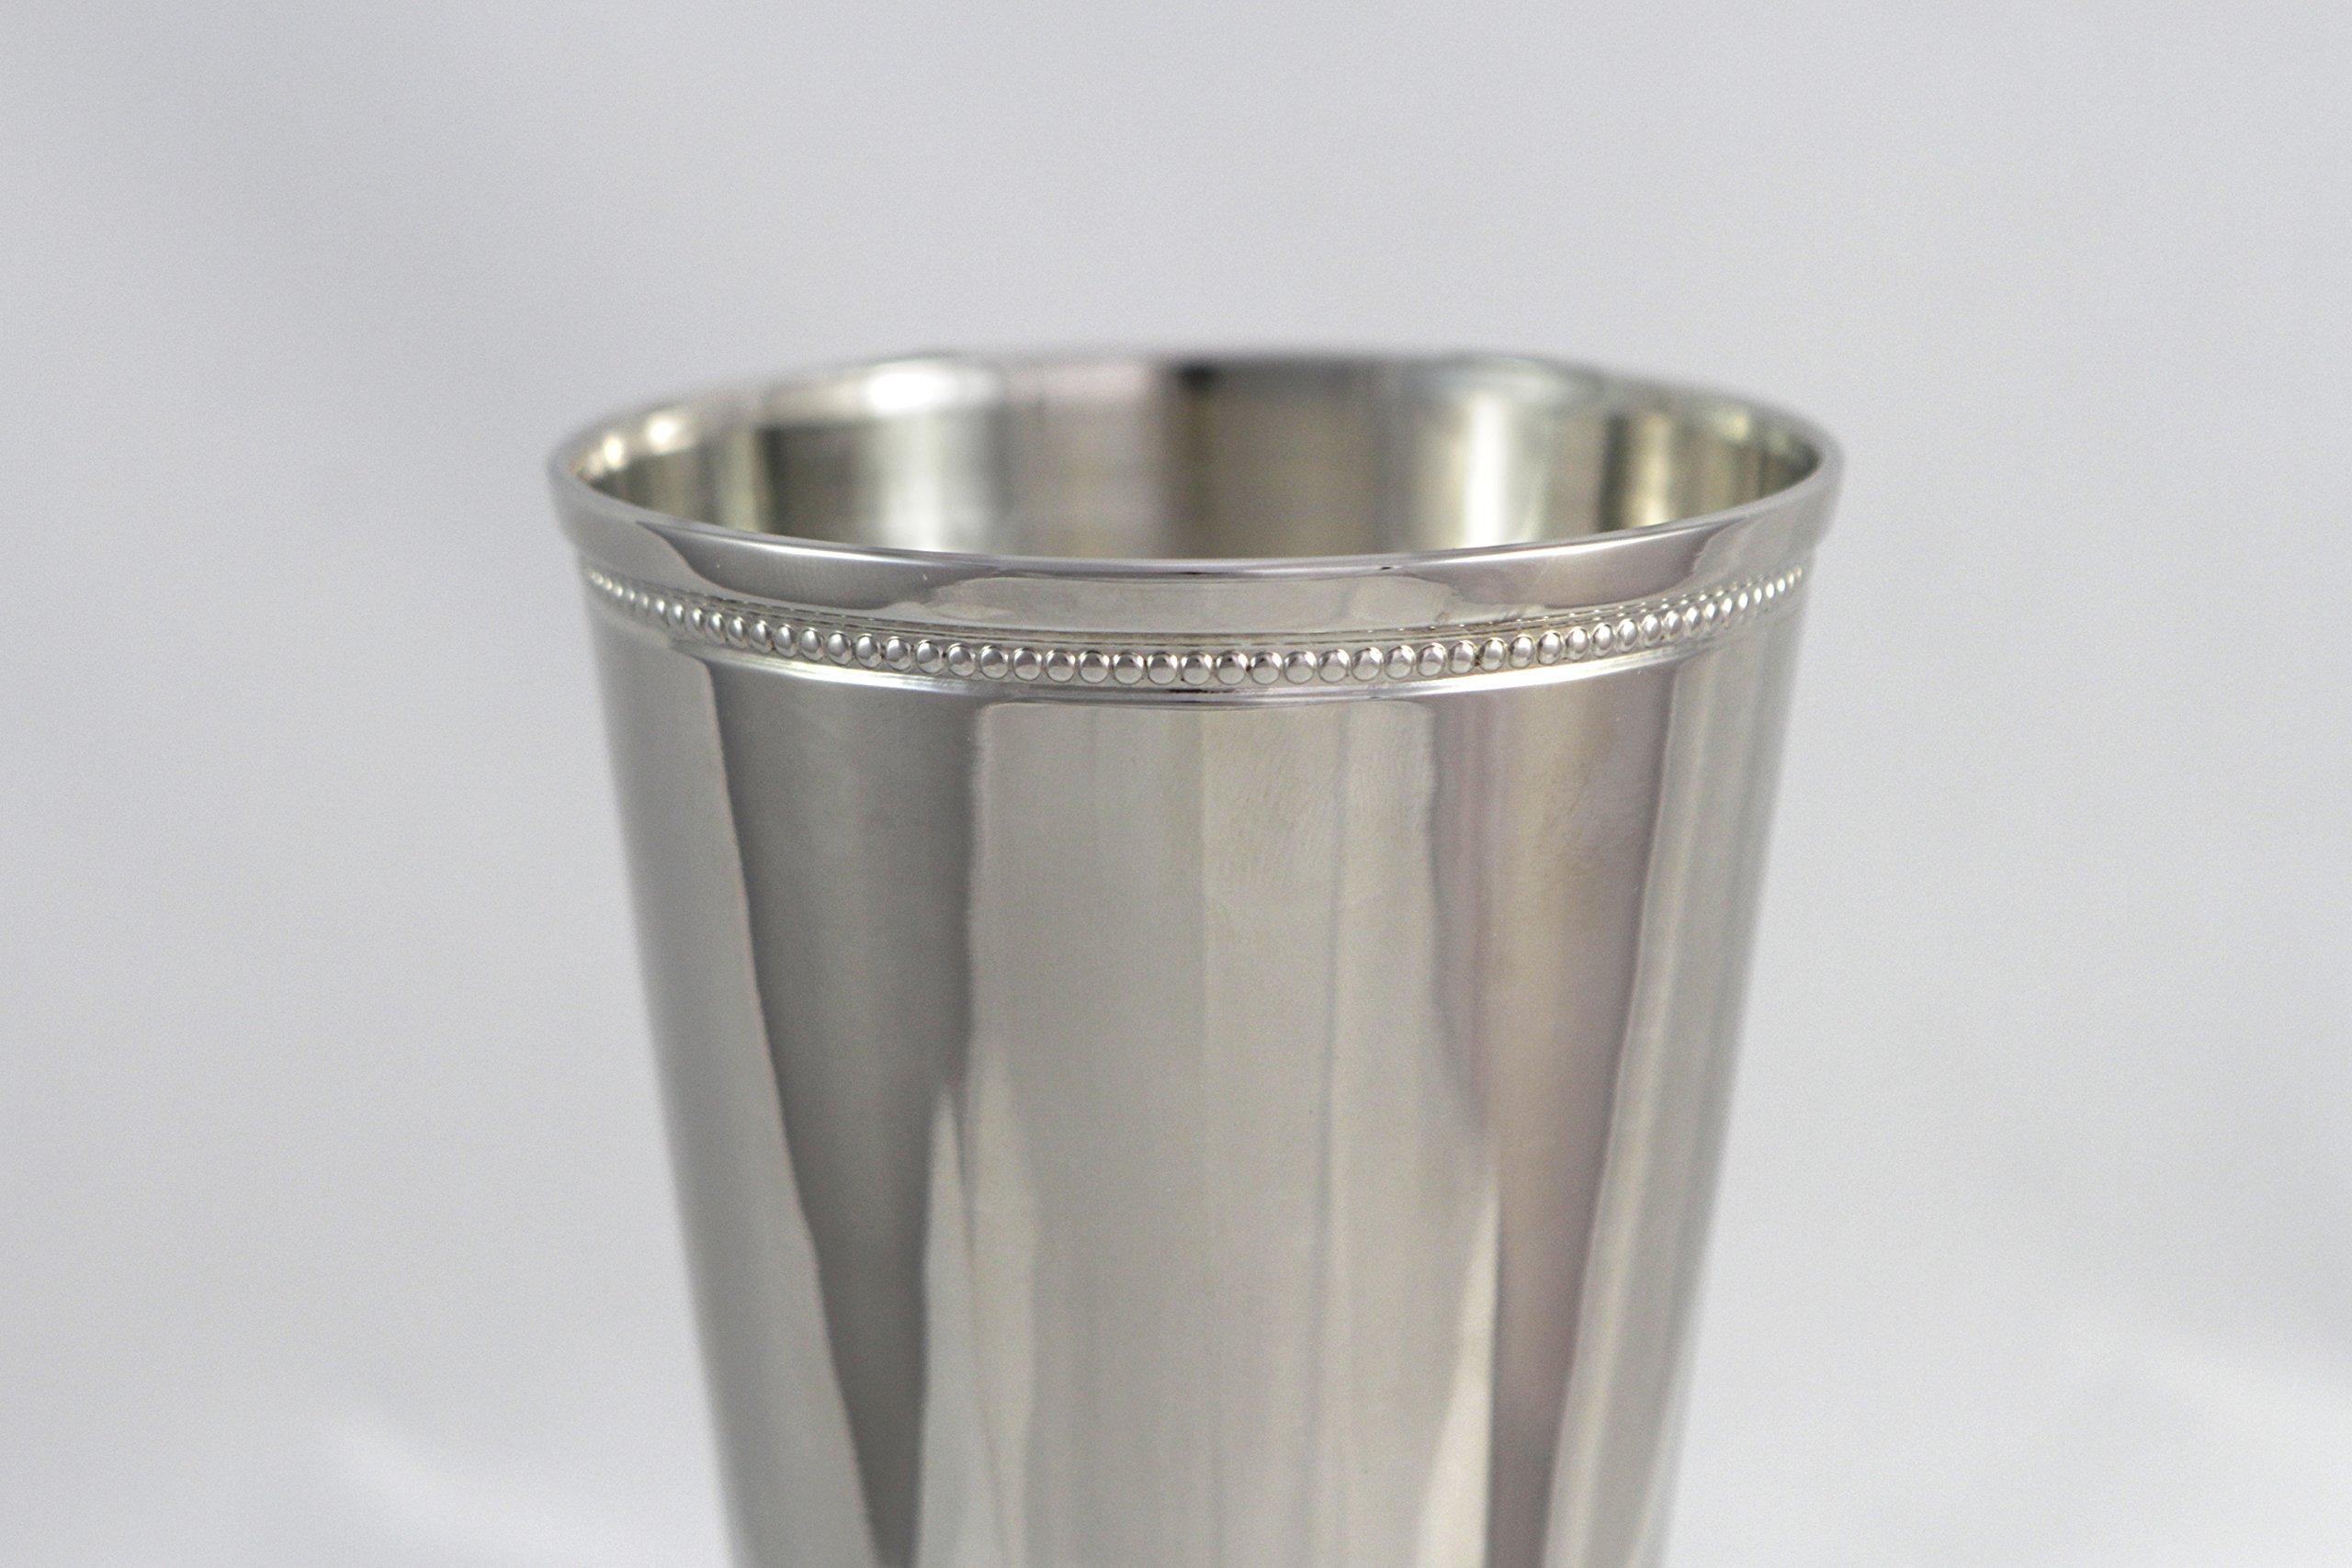 Alchemade AL 2102 JULEP CUP